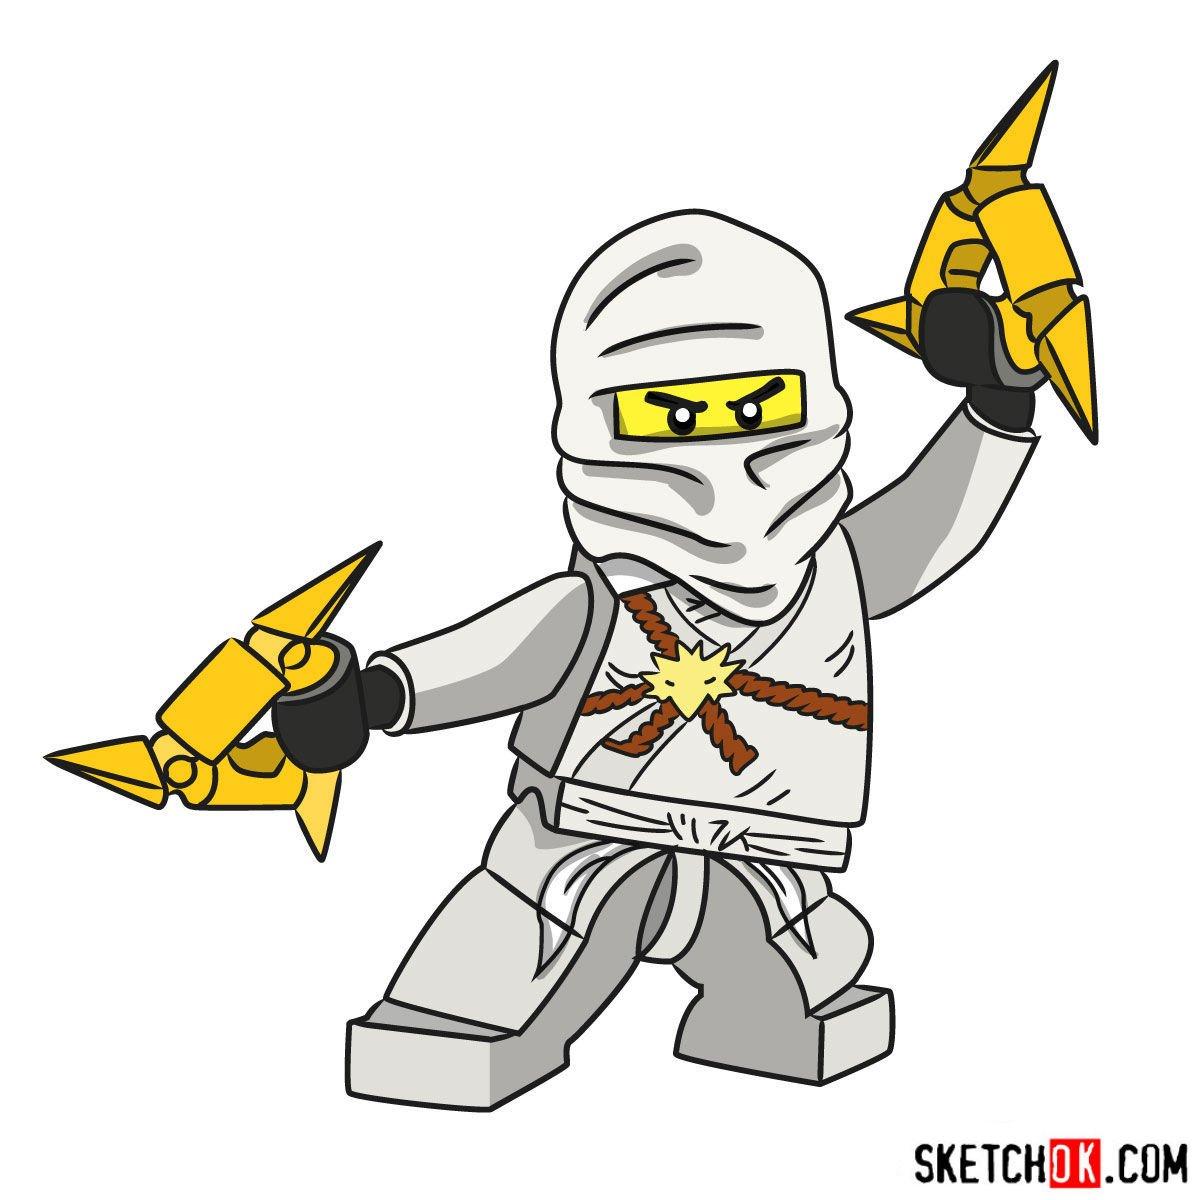 Lego Ninjago Step By Step Drawing Tutorials